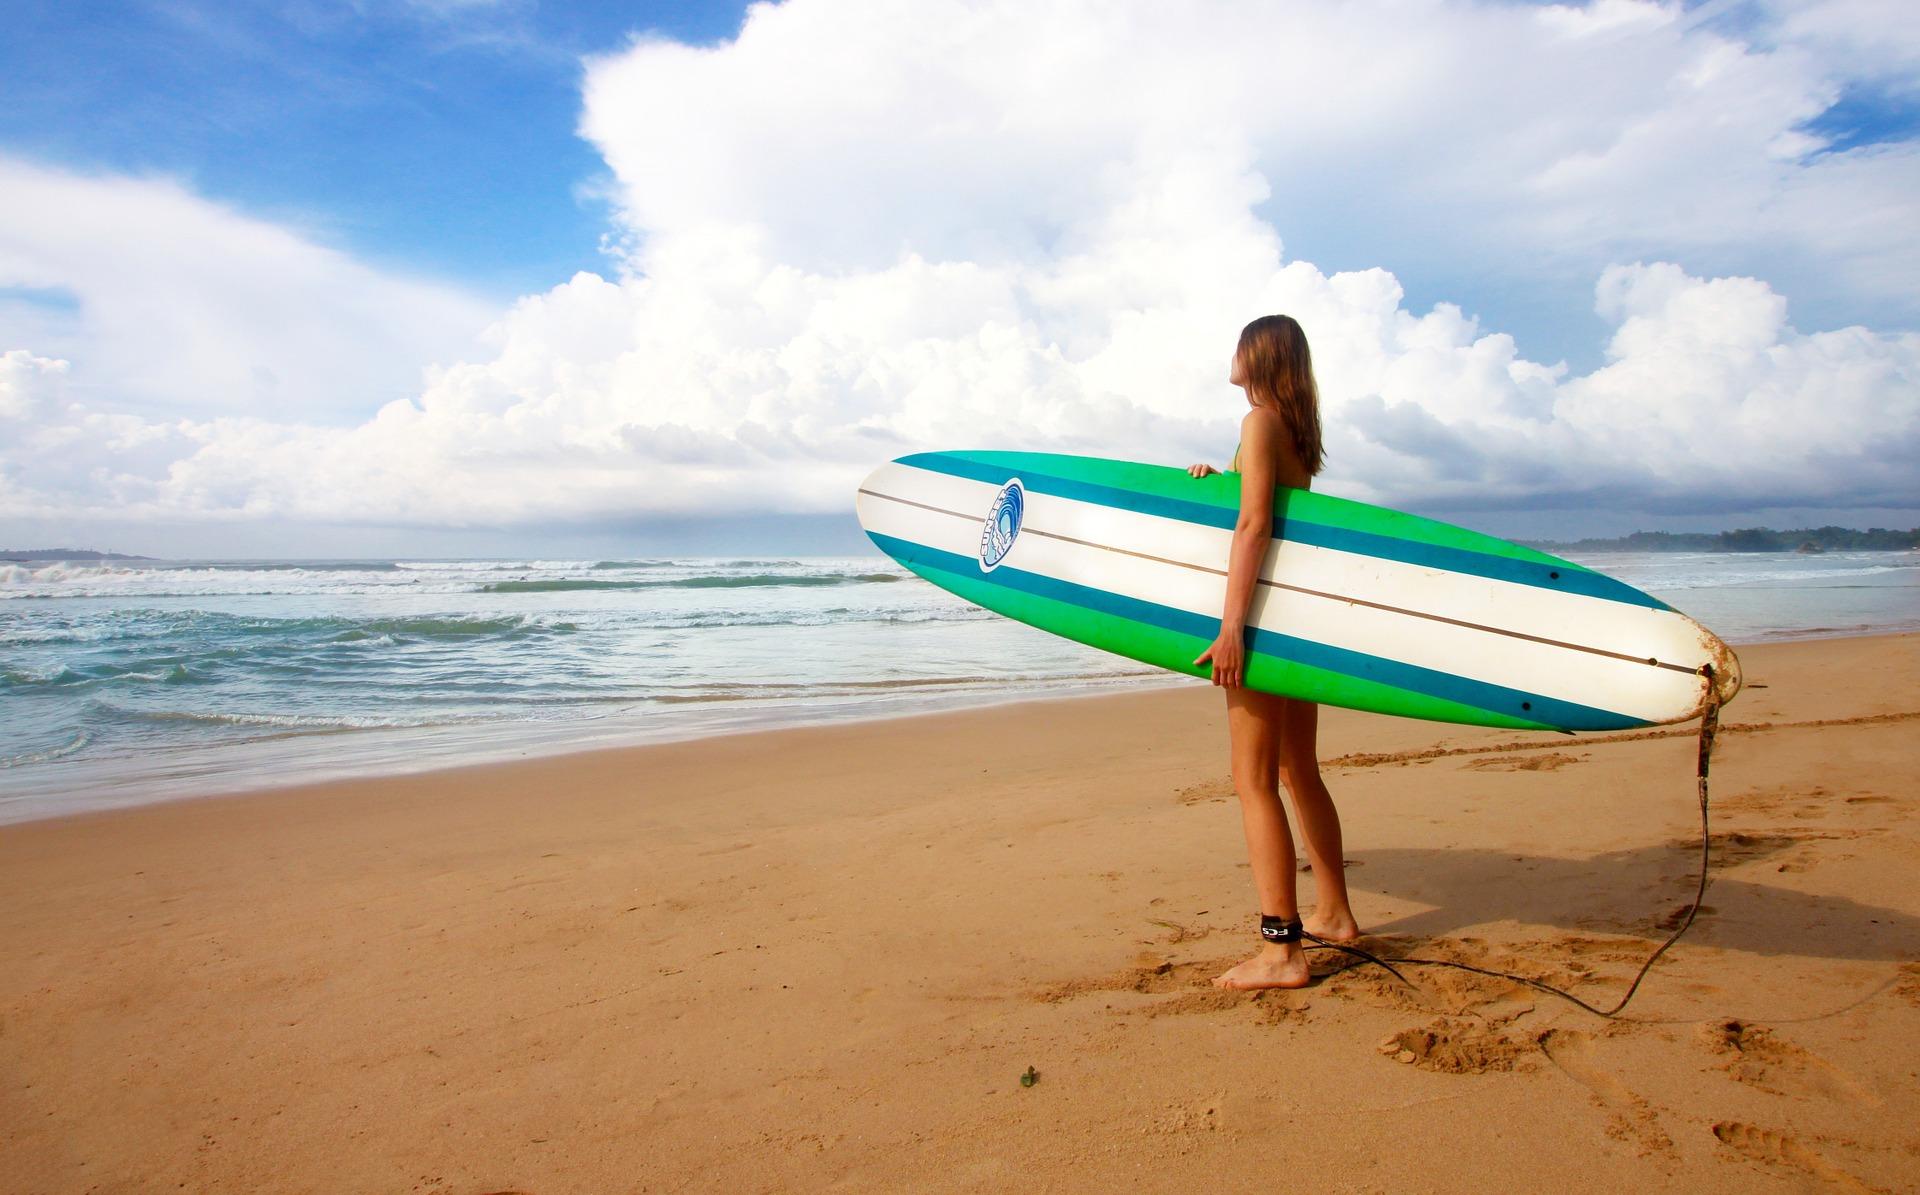 Surf_EVJF_Canaries_CC0.jpg?1544811041